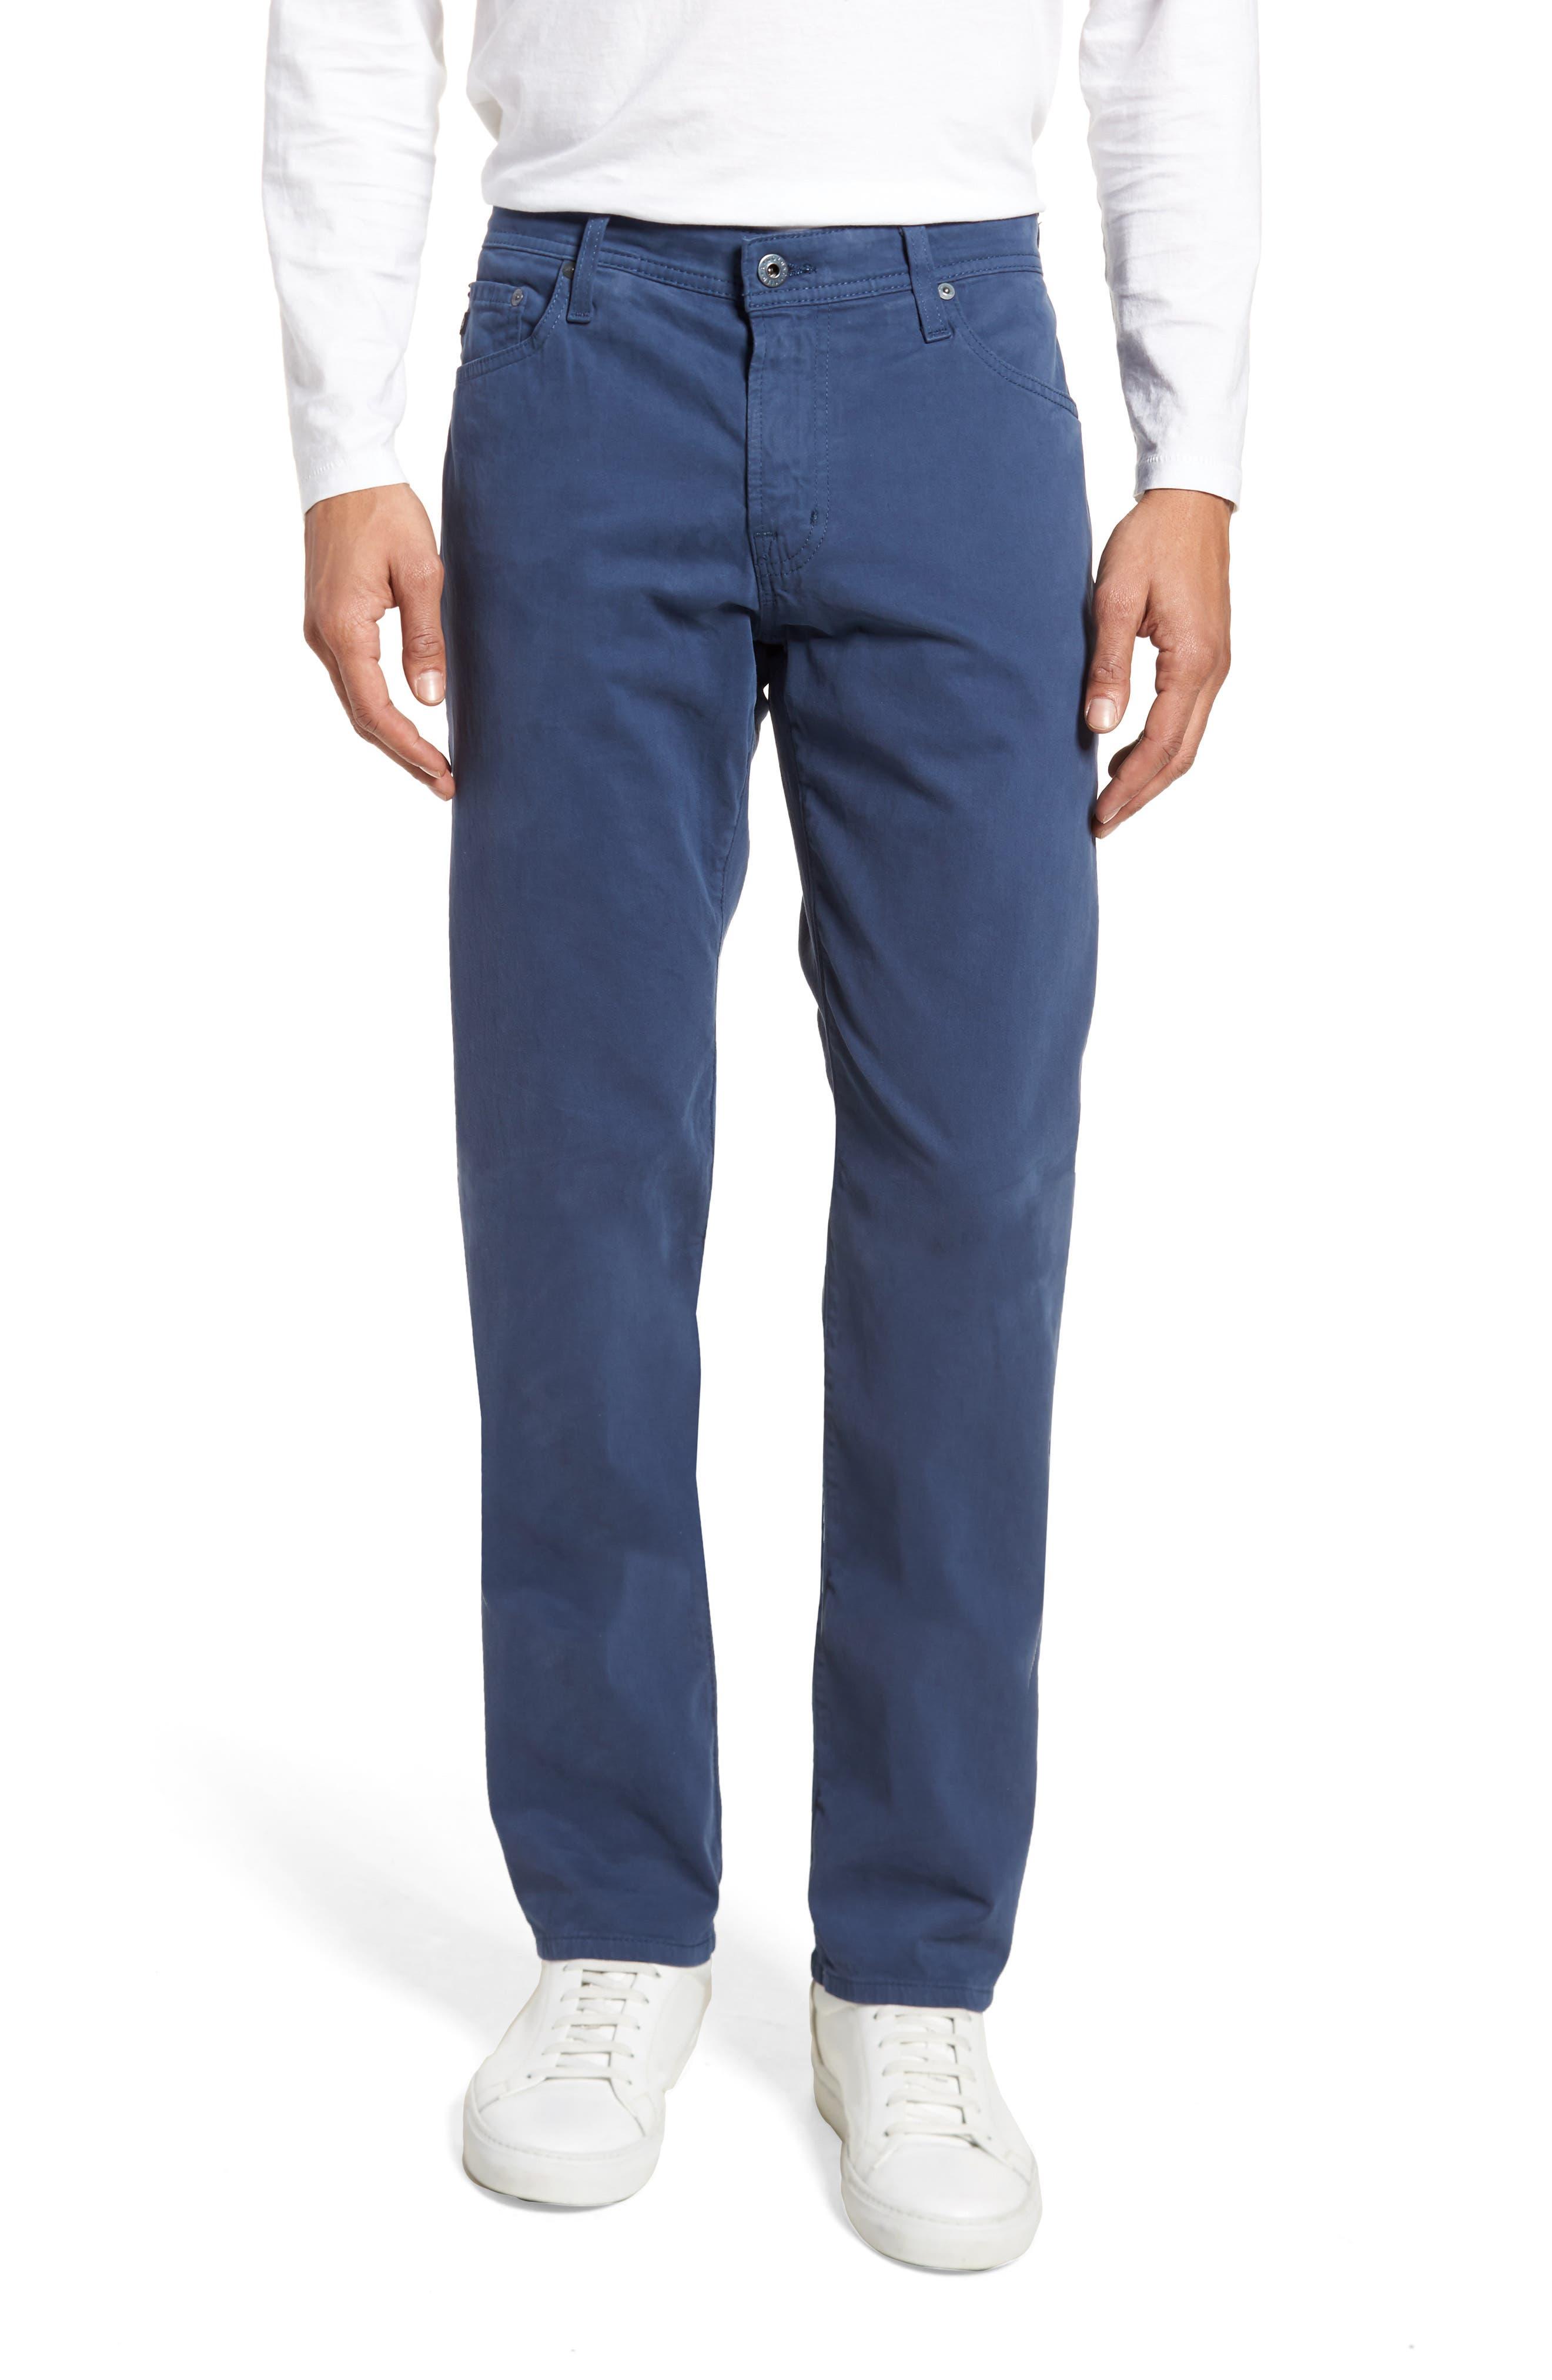 Graduate SUD Slim Straight Leg Pants,                             Main thumbnail 1, color,                             Pacific Coast